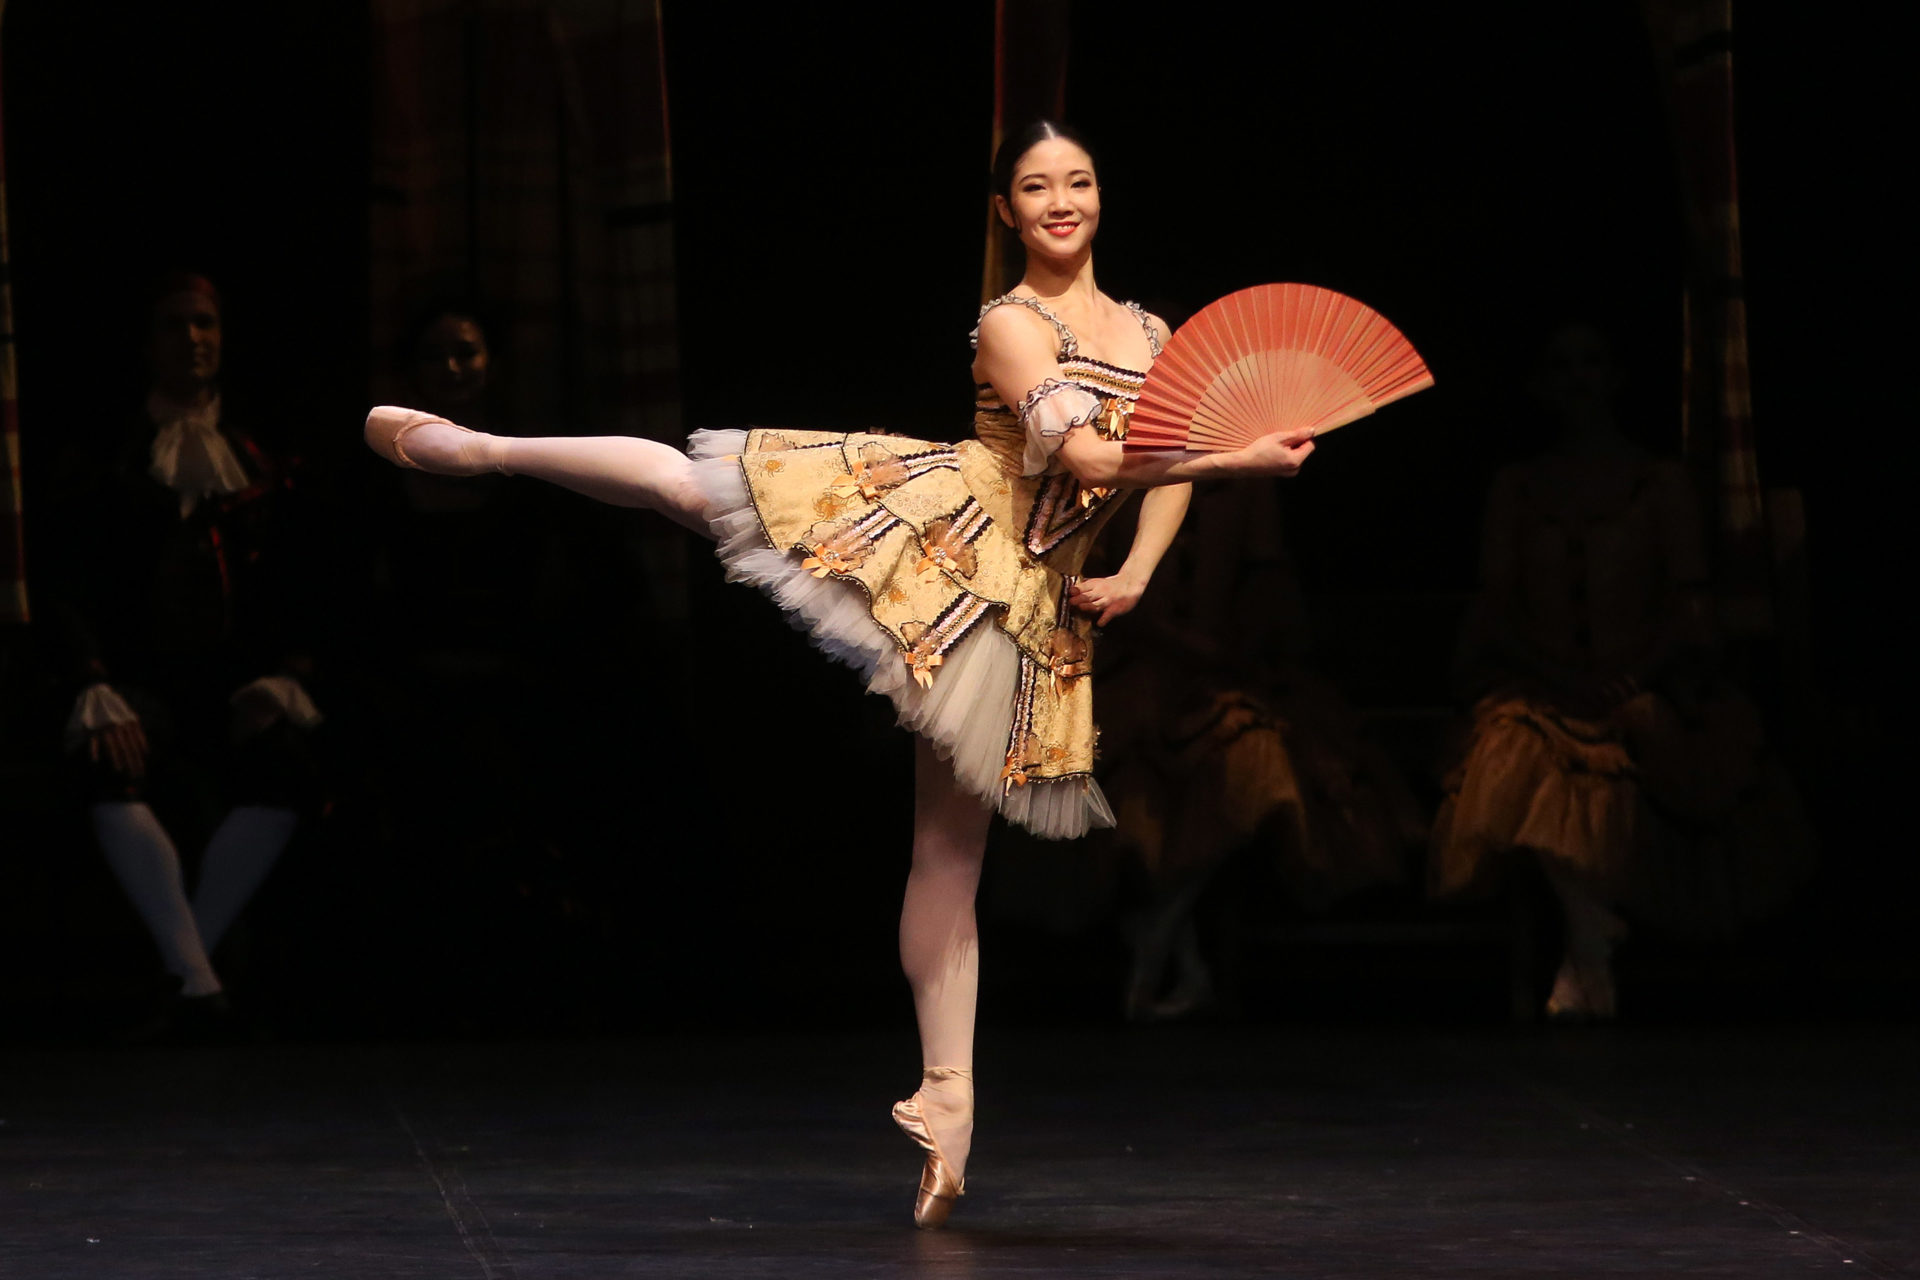 Don_Quixote_HH_Ballett_Foto_AnjaBeutler.de_690